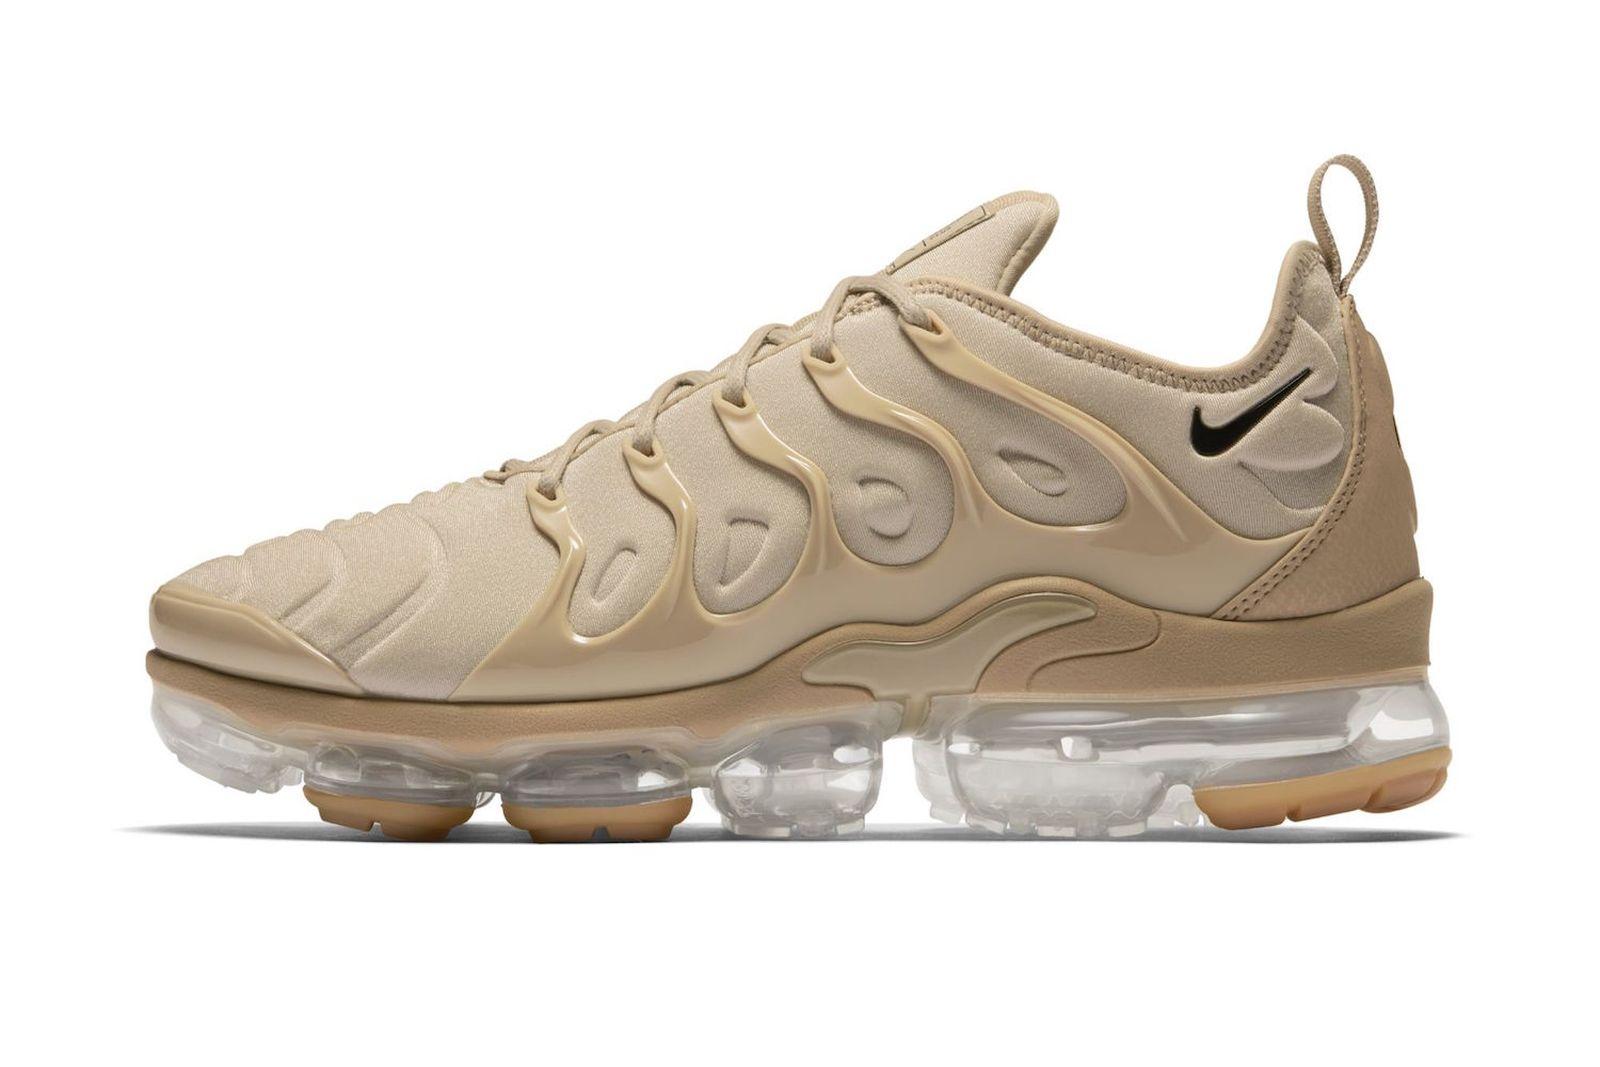 Nike Air VaporMax Plus Military Pack: Release Date, Price, & More